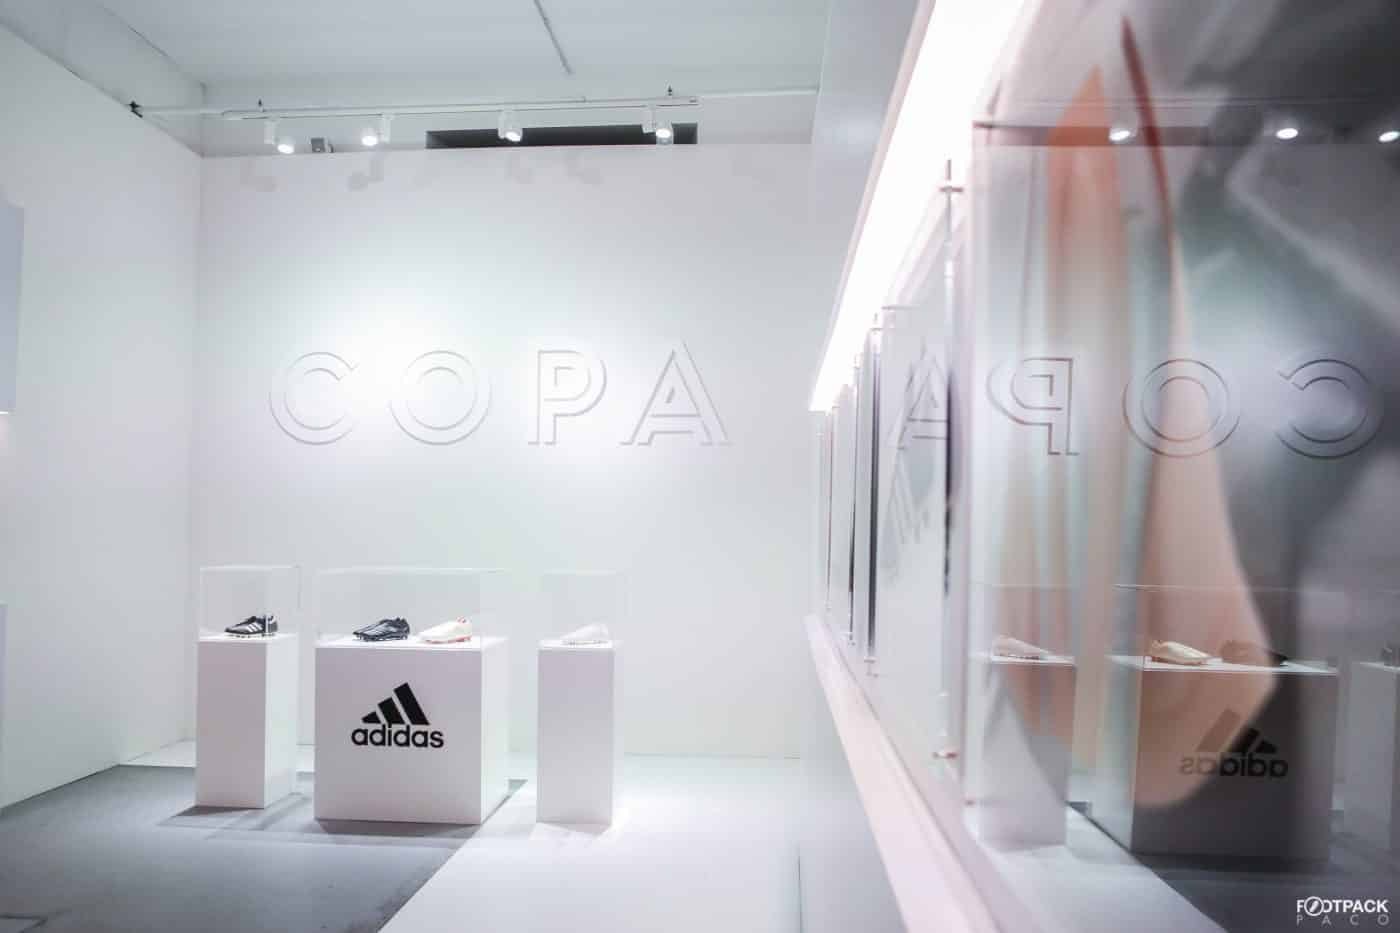 lancement-adidas-copa-19-milan-novembre-2018-5